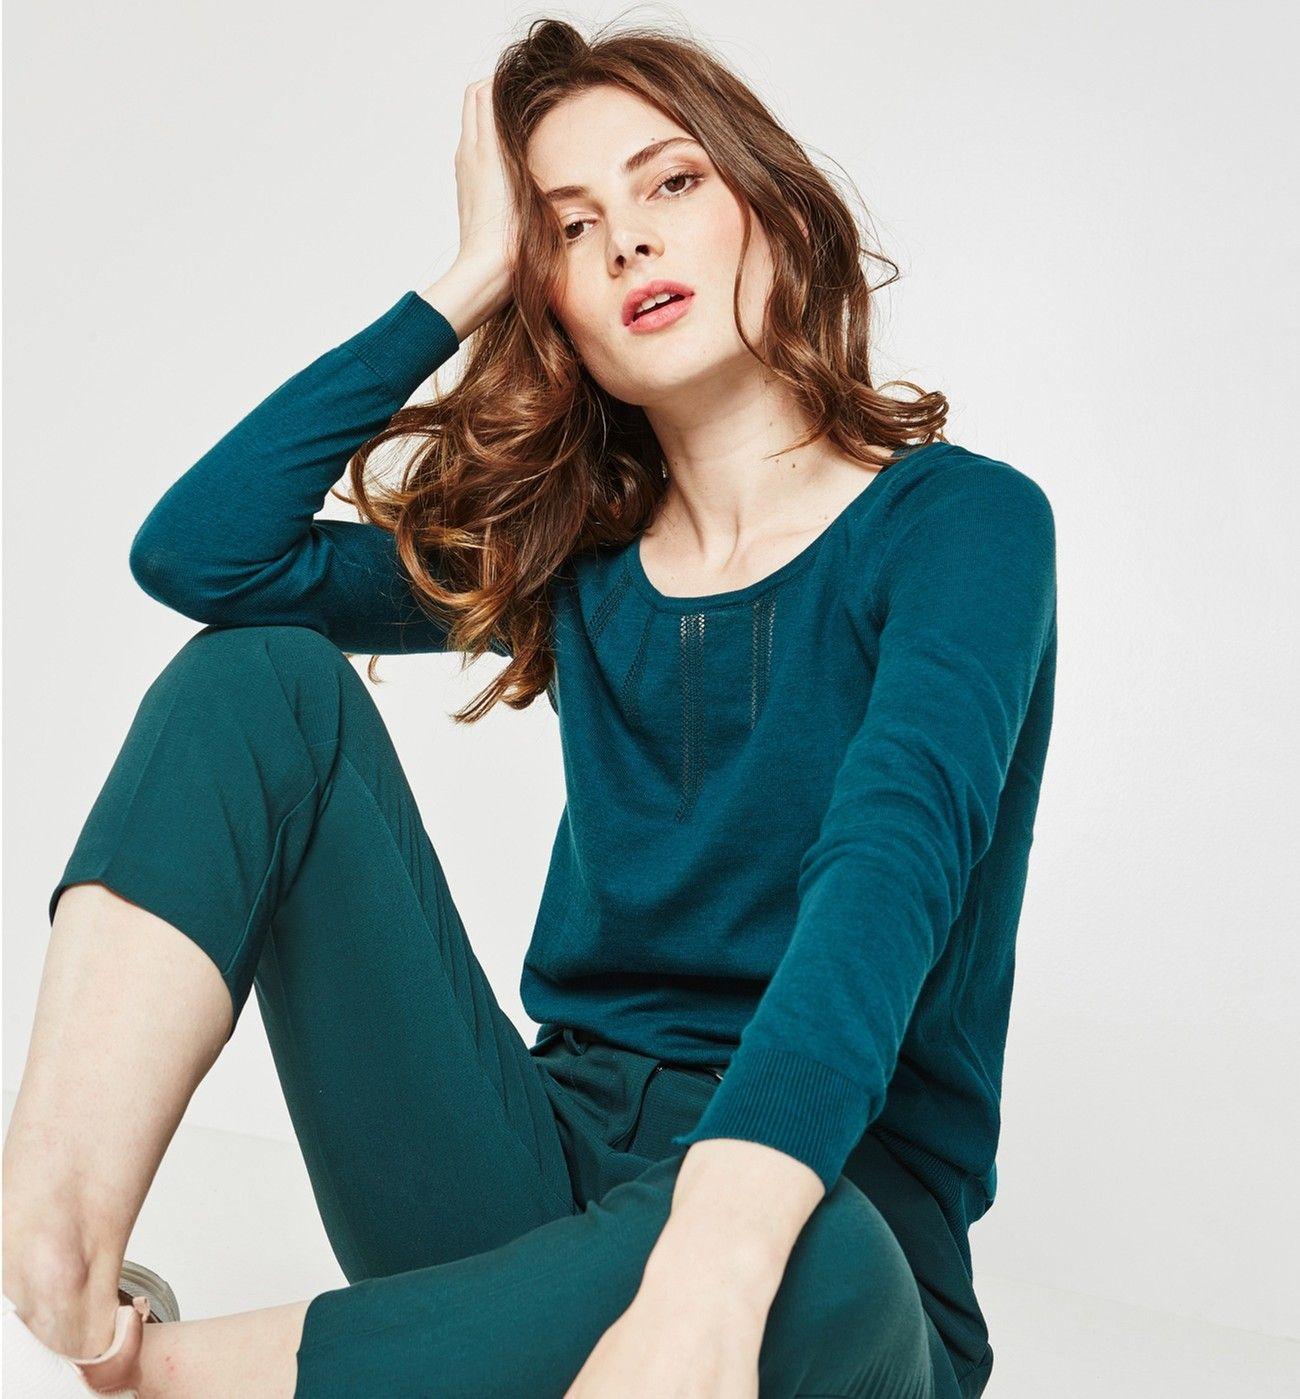 Pull fin Femme - Vert émeraude - Pulls et gilets - Femme - Promod ... 777bf063f895